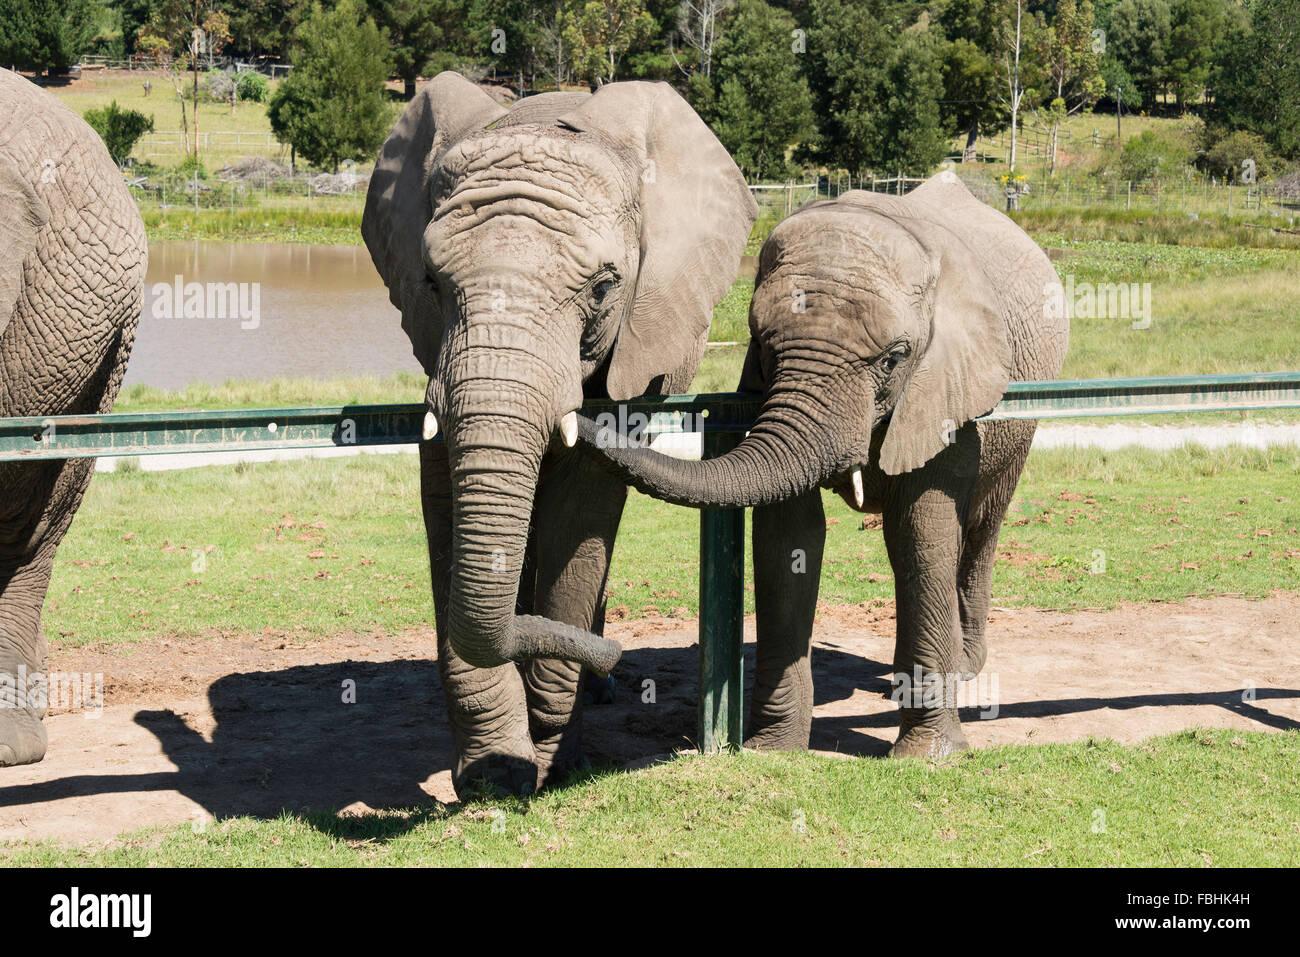 Elephants at Knysna Elephant Park, Plettenberg Bay, Knysna, Knysna Municipality, Western Cape Province, Republic - Stock Image